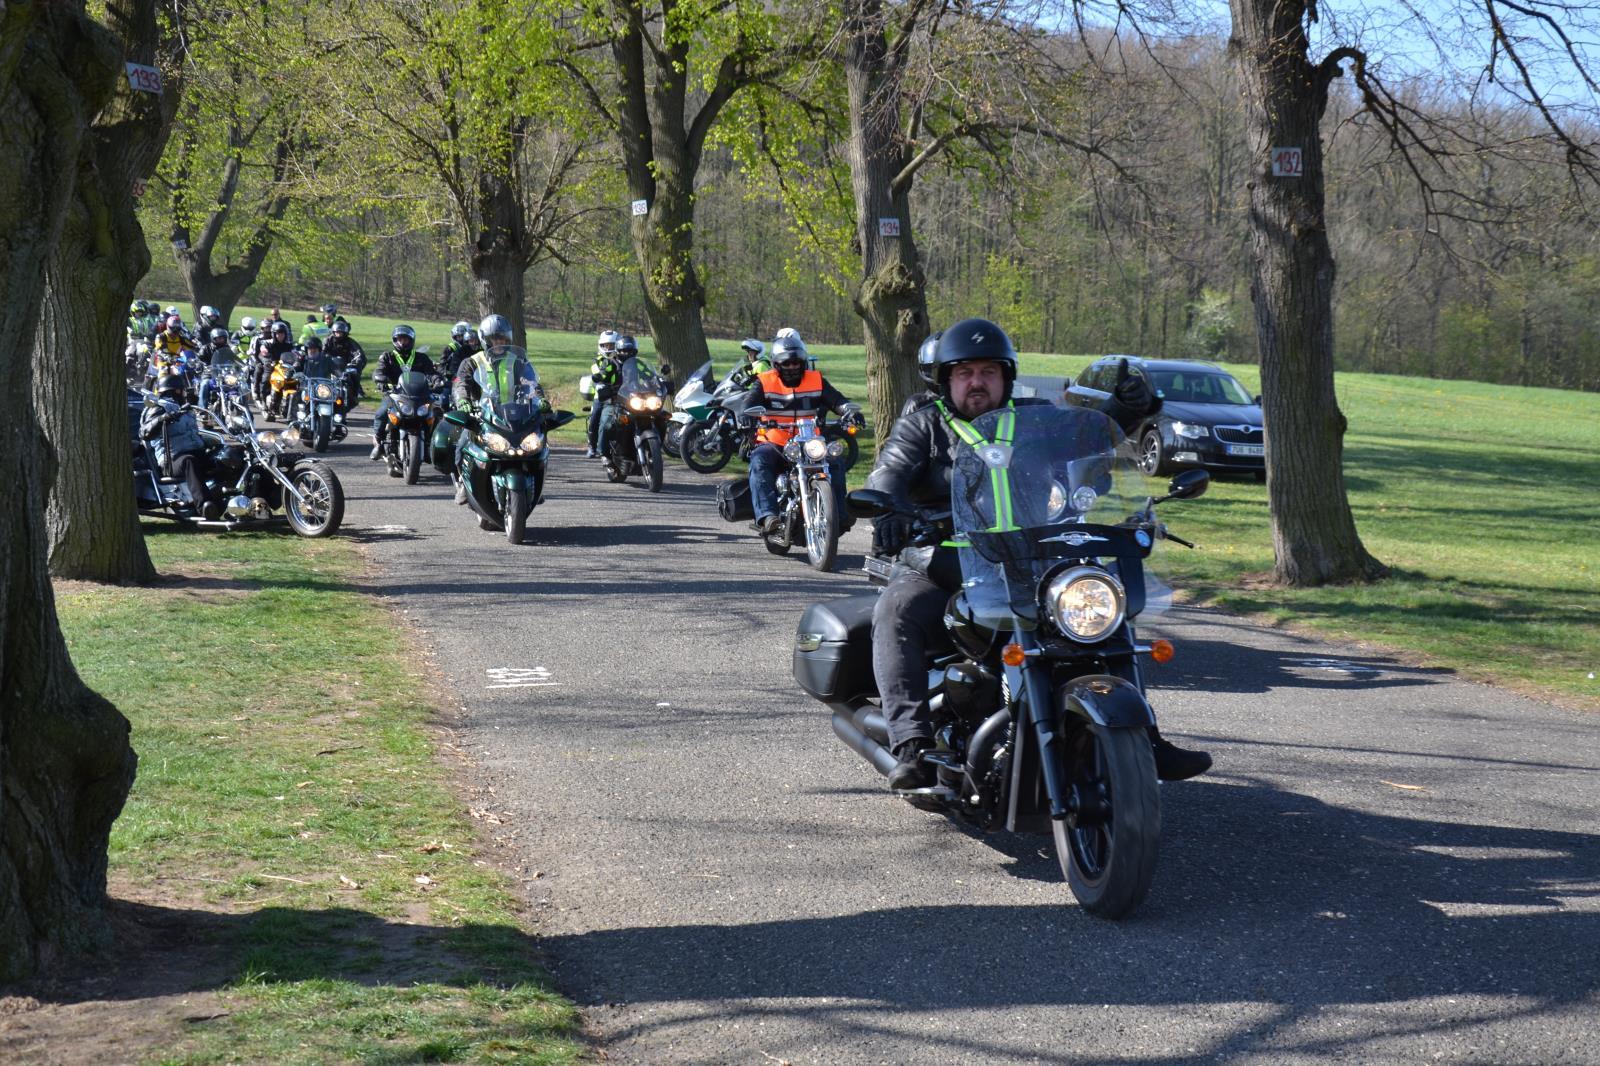 2019-04-20-zacneme-spolu-aneb-kolama-dolu-motorky-policie- (6)